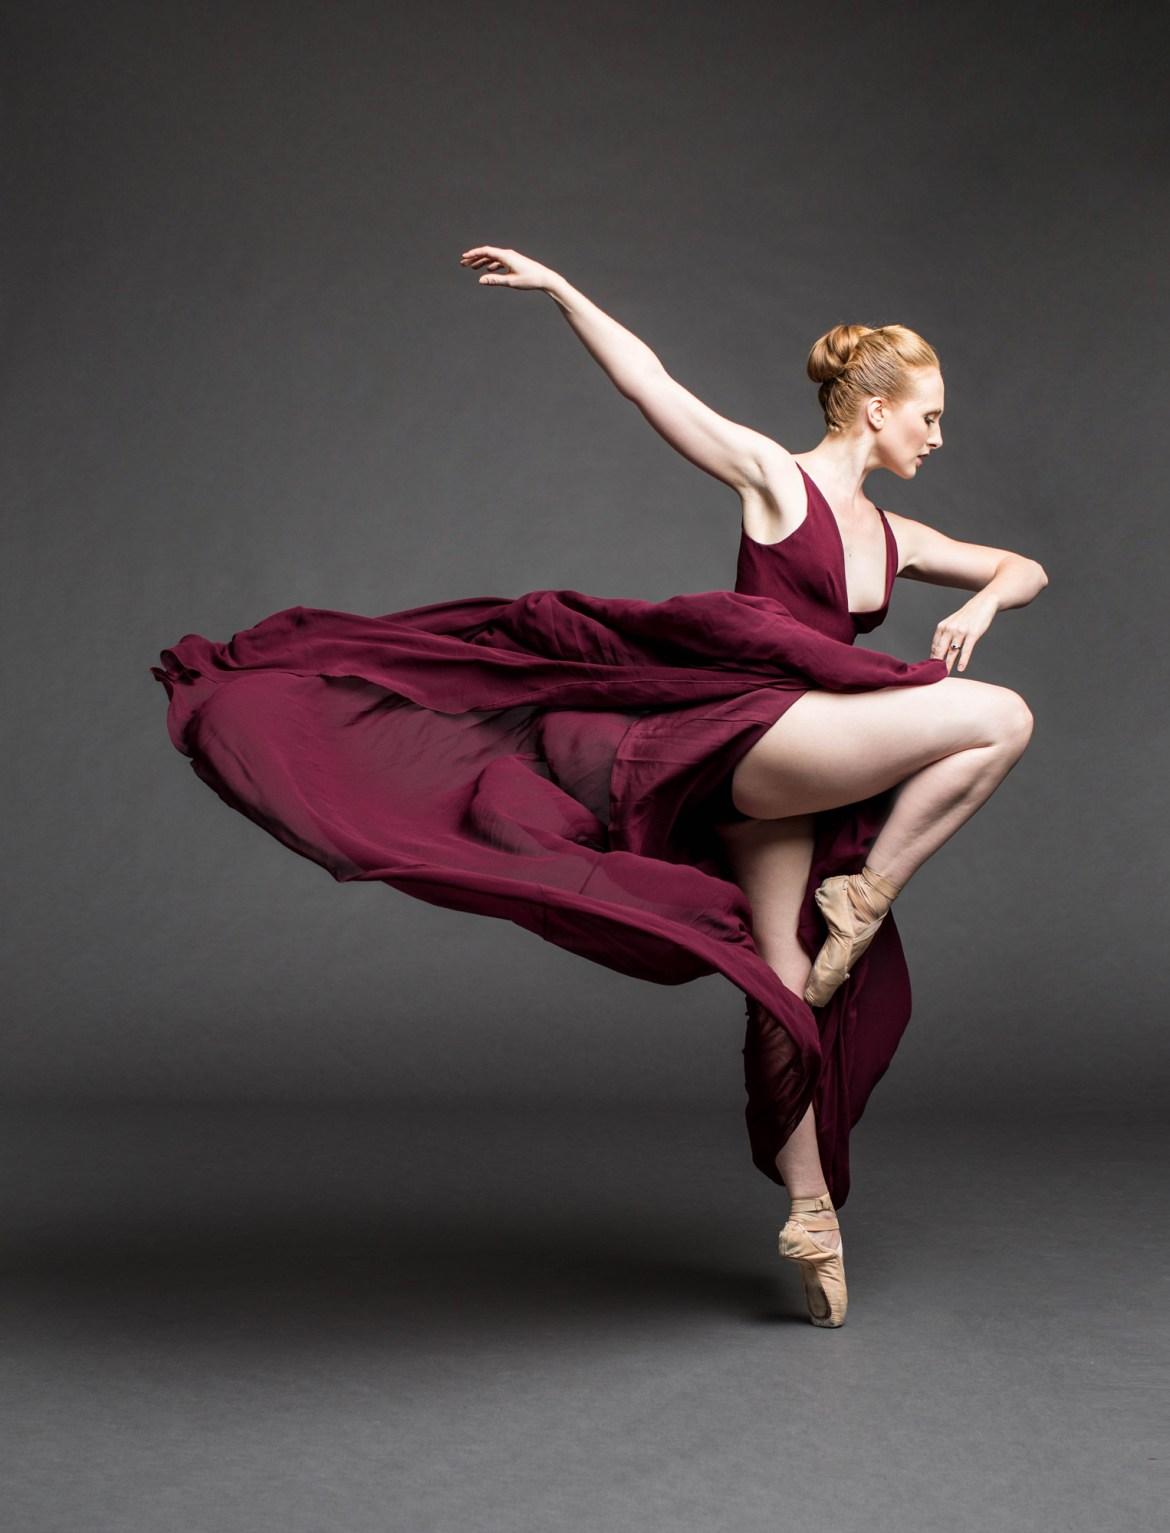 Dancer: Jordan Mercer Photo: Cheryl Mann - Cheryl Mann Productions